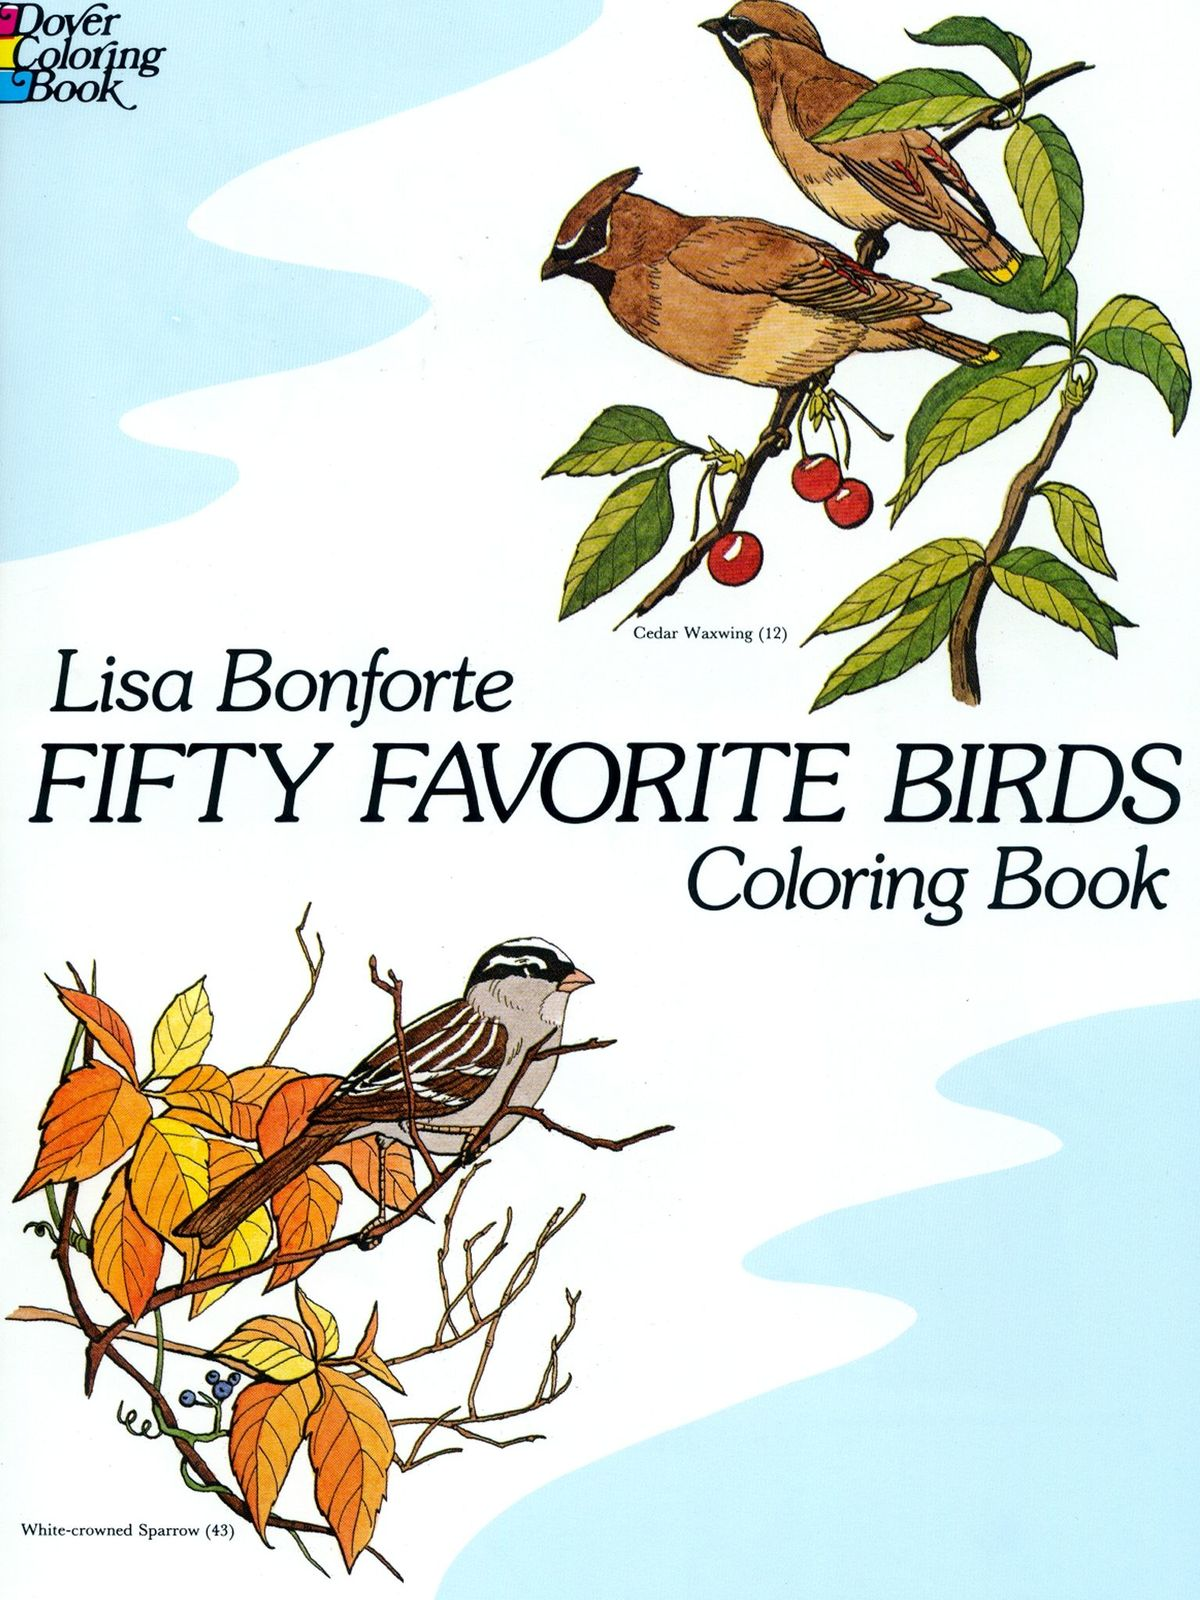 Fifty Favorite Birds